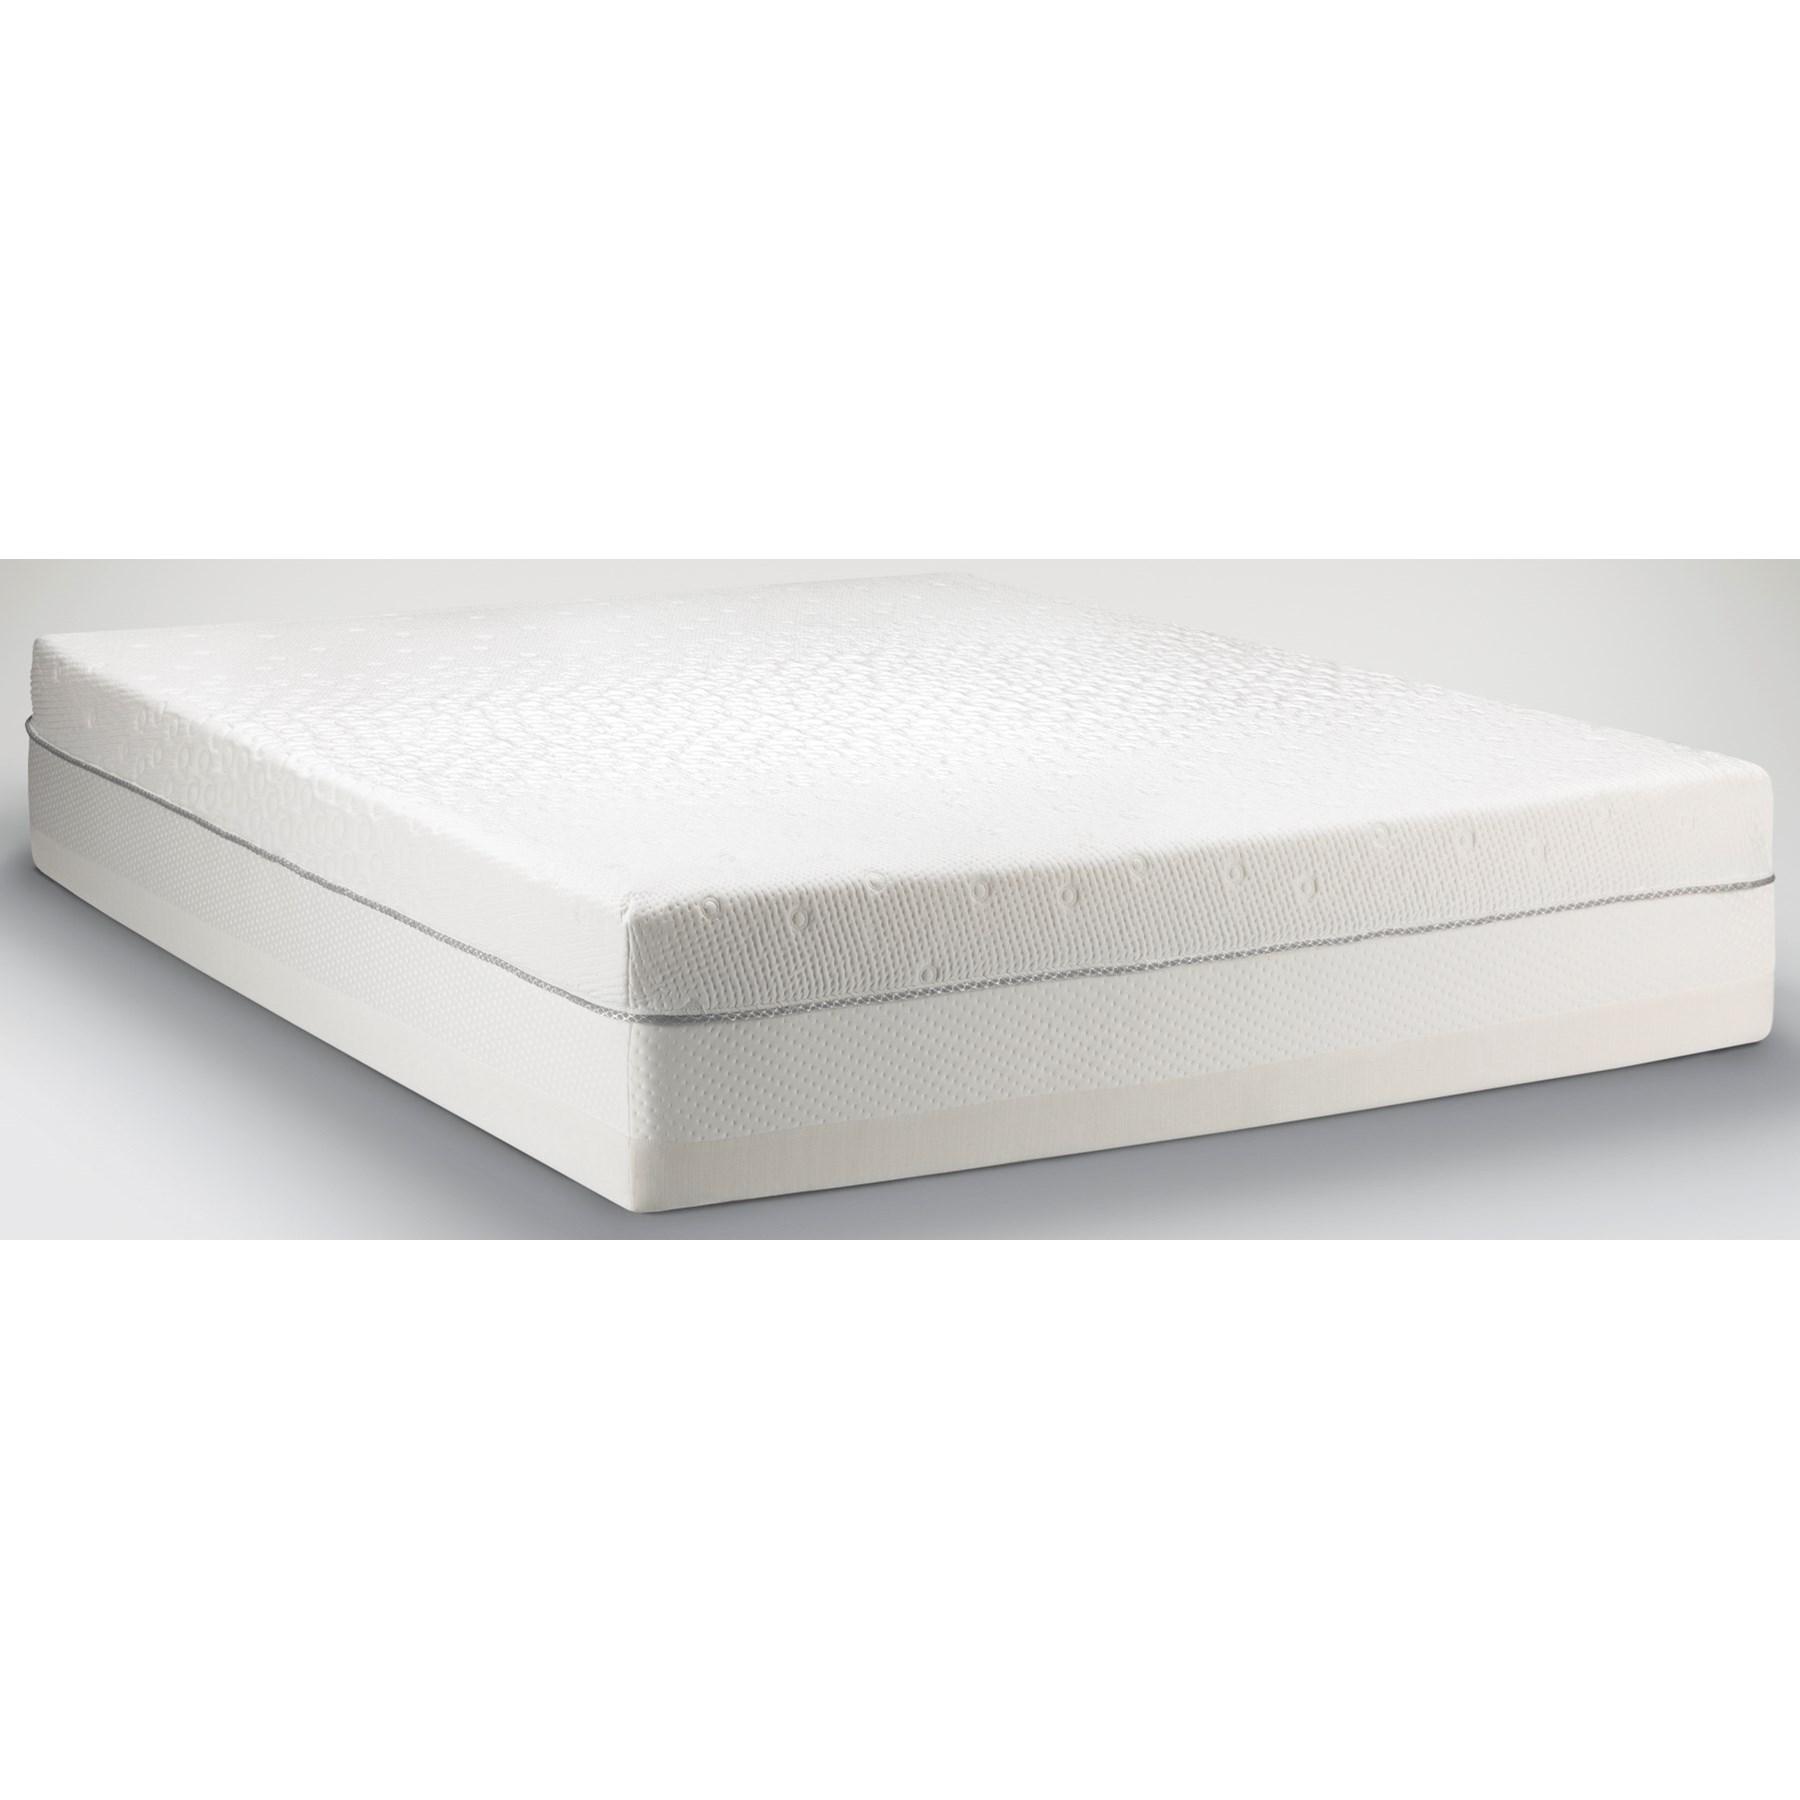 Tempur-Pedic®  TEMPUR-Choice™  Supreme King Firm to Medium Soft Mattress  - Item Number: 10111170